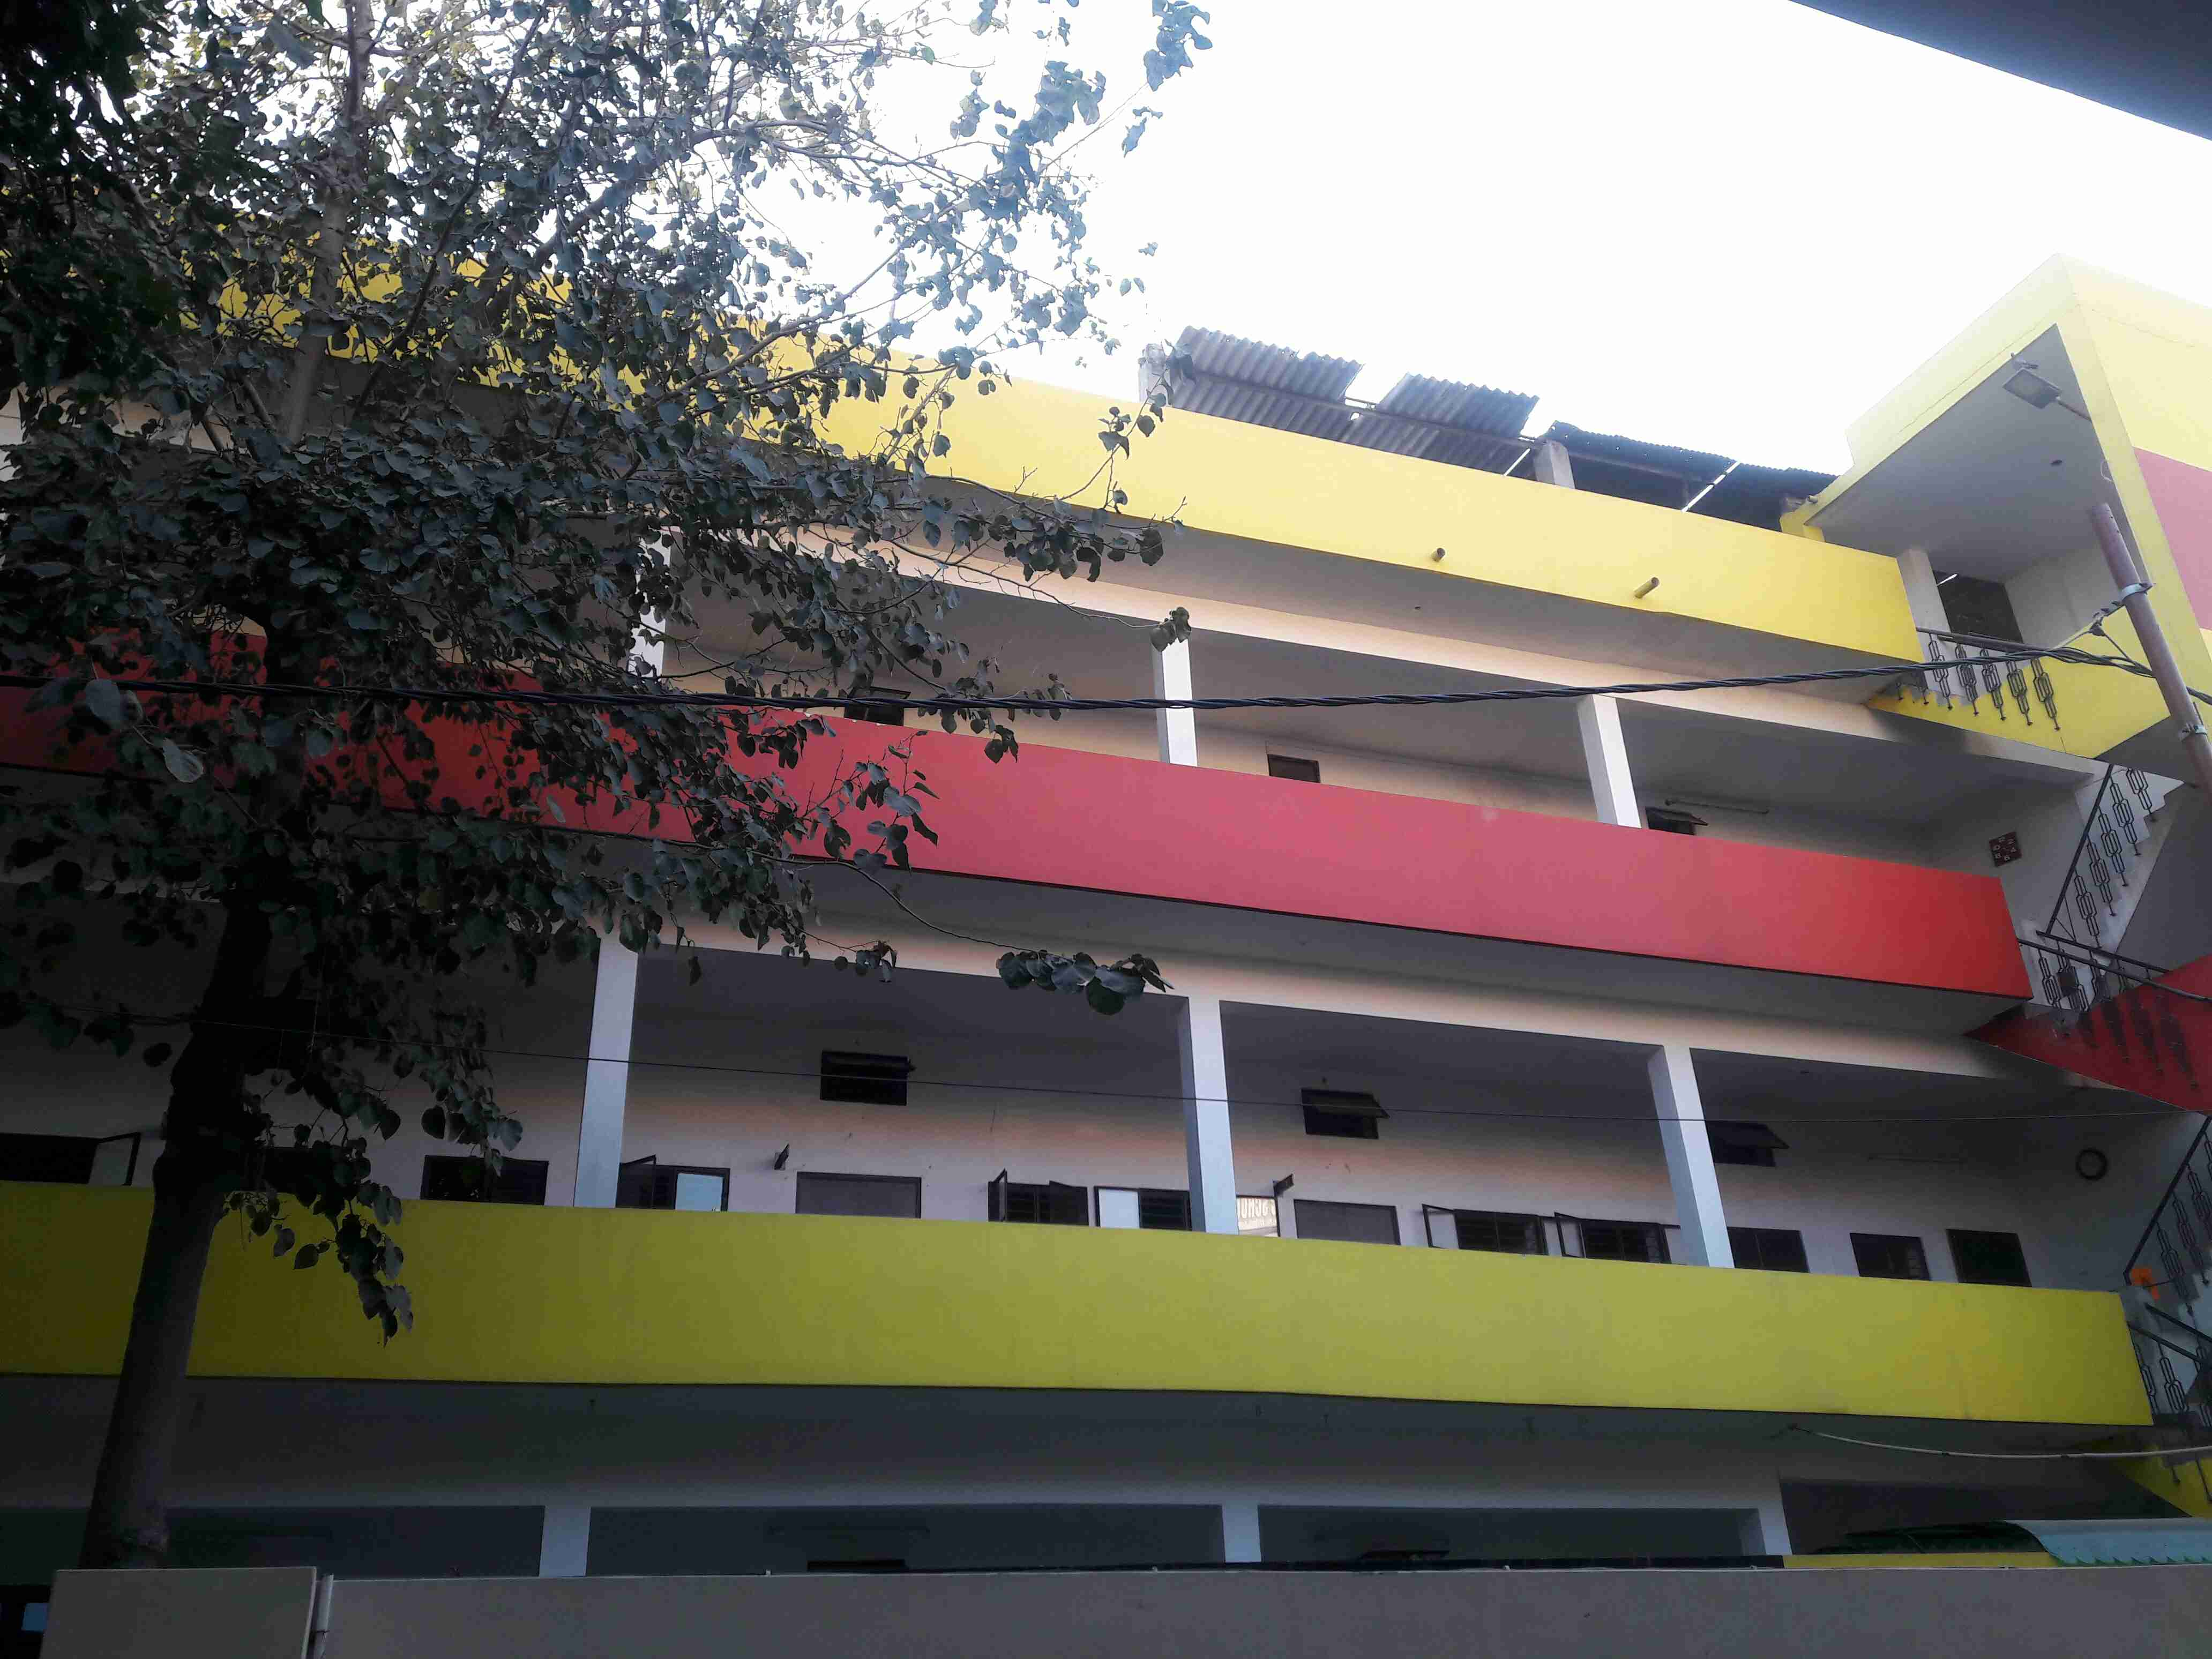 MEERUT CITY PUBLIC SCHOOL SHIVSHAKTI NAGAR MEERUT UTTAR PRADESH 2130596